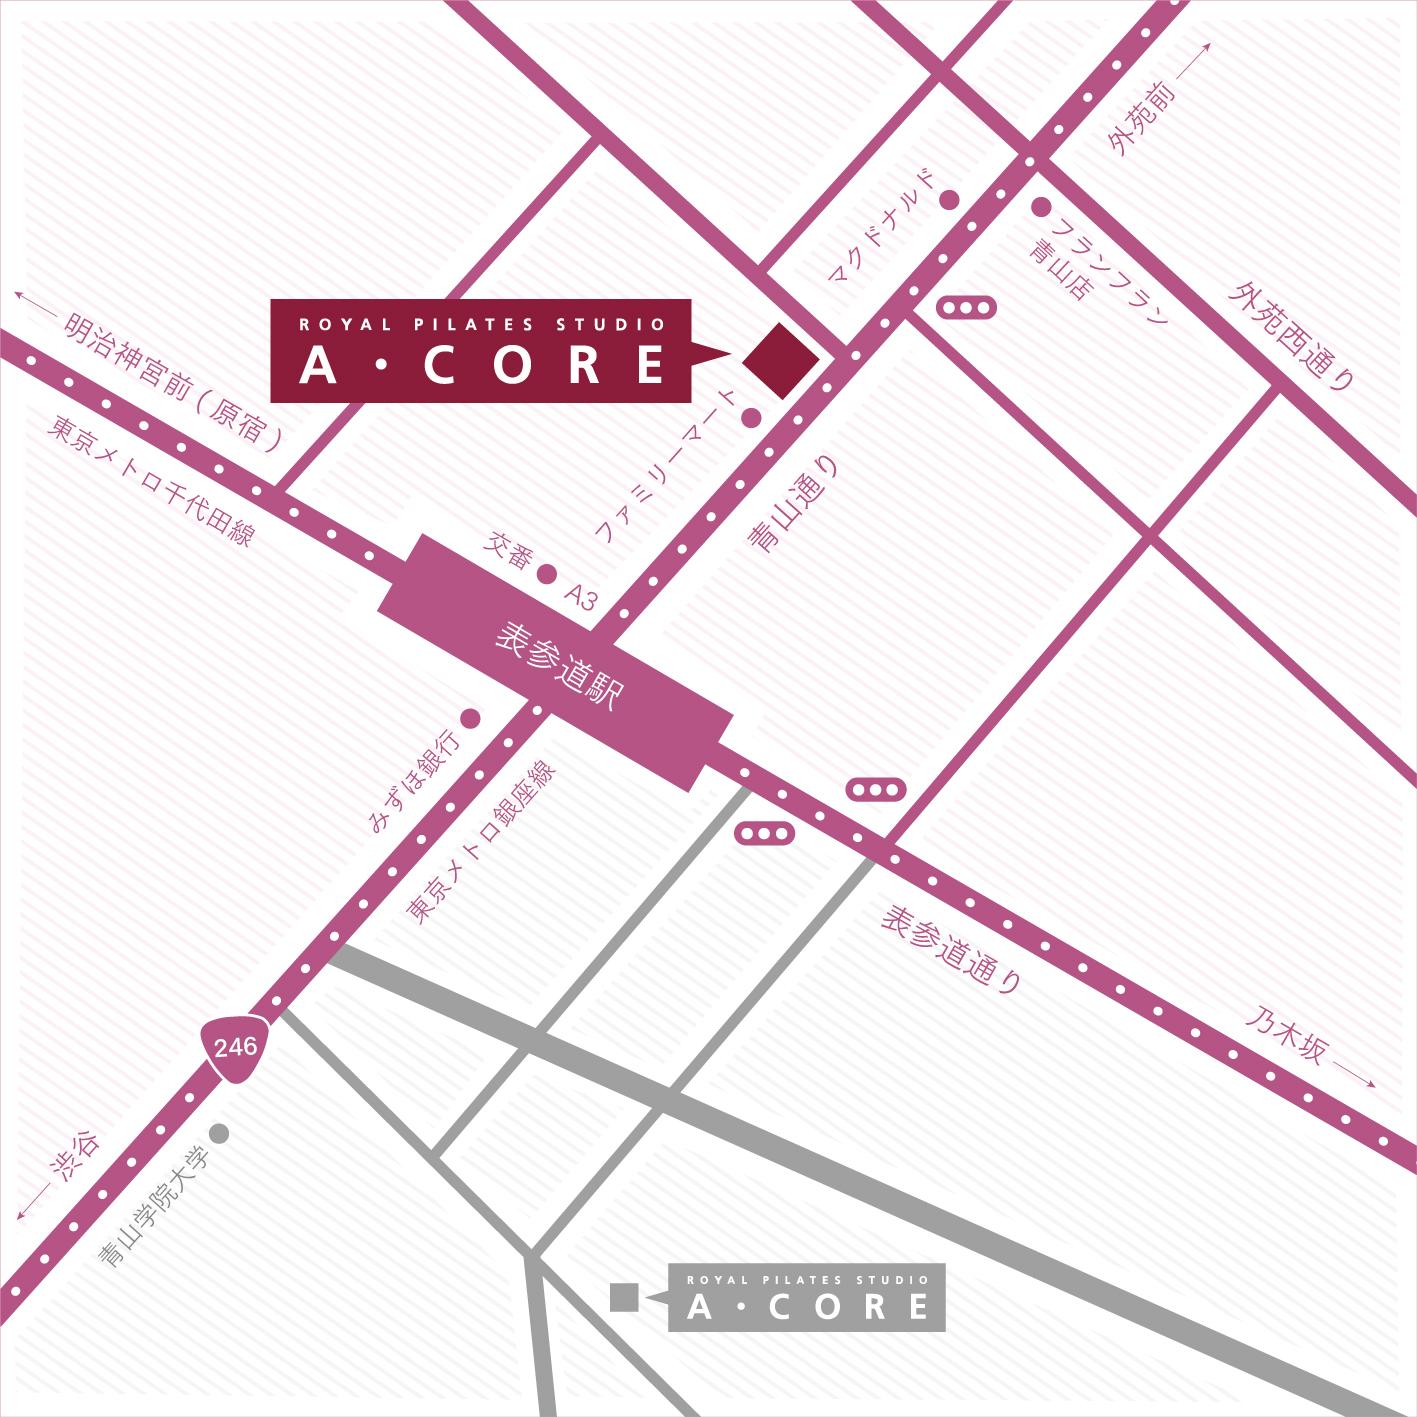 acore_map_2